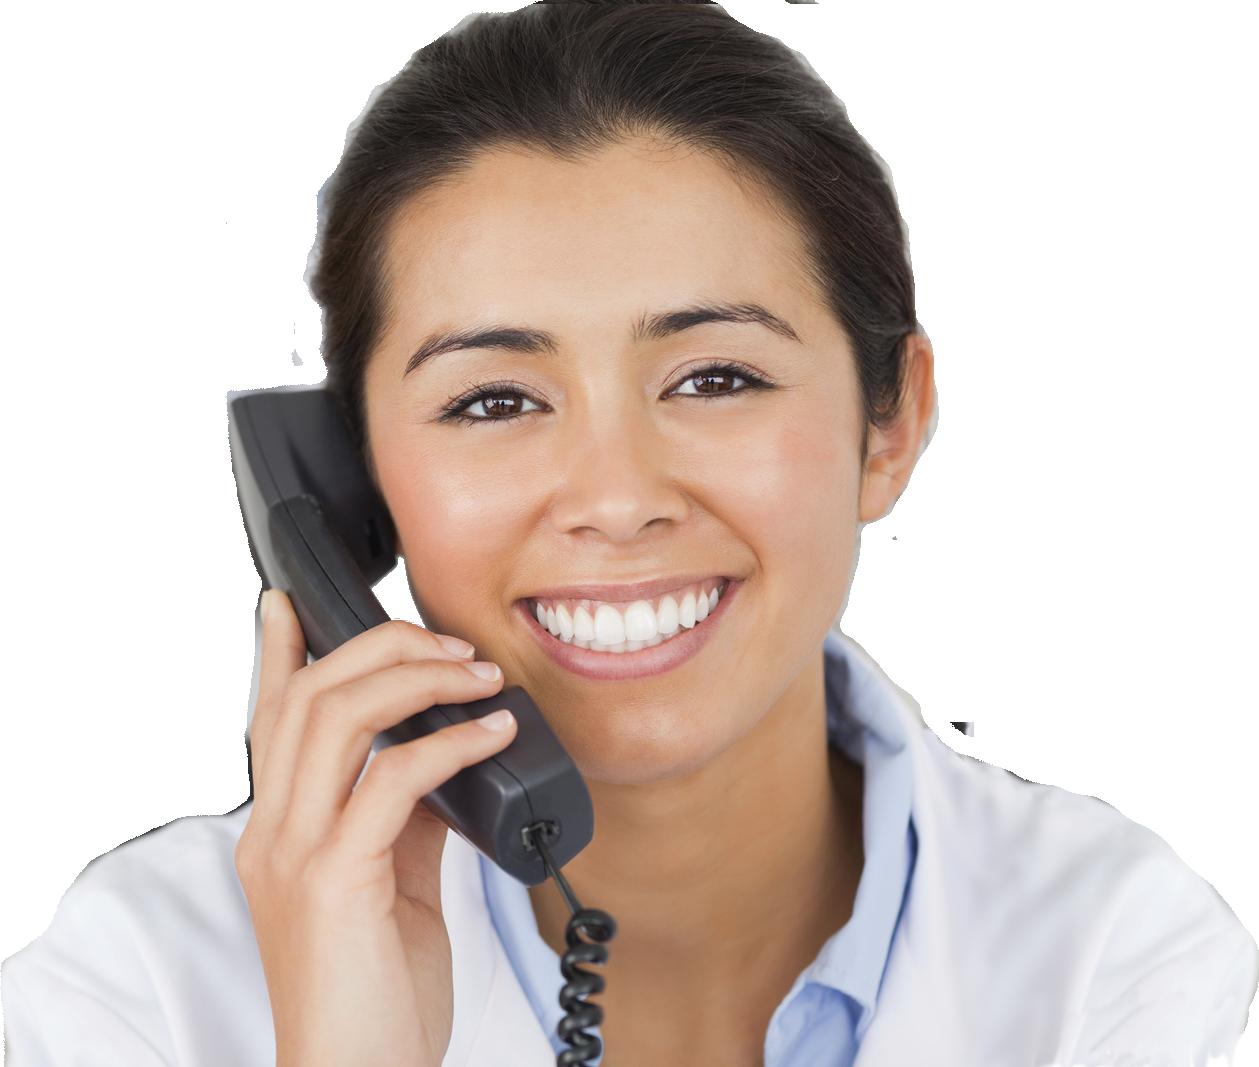 nurses-station-telemetry-monitor